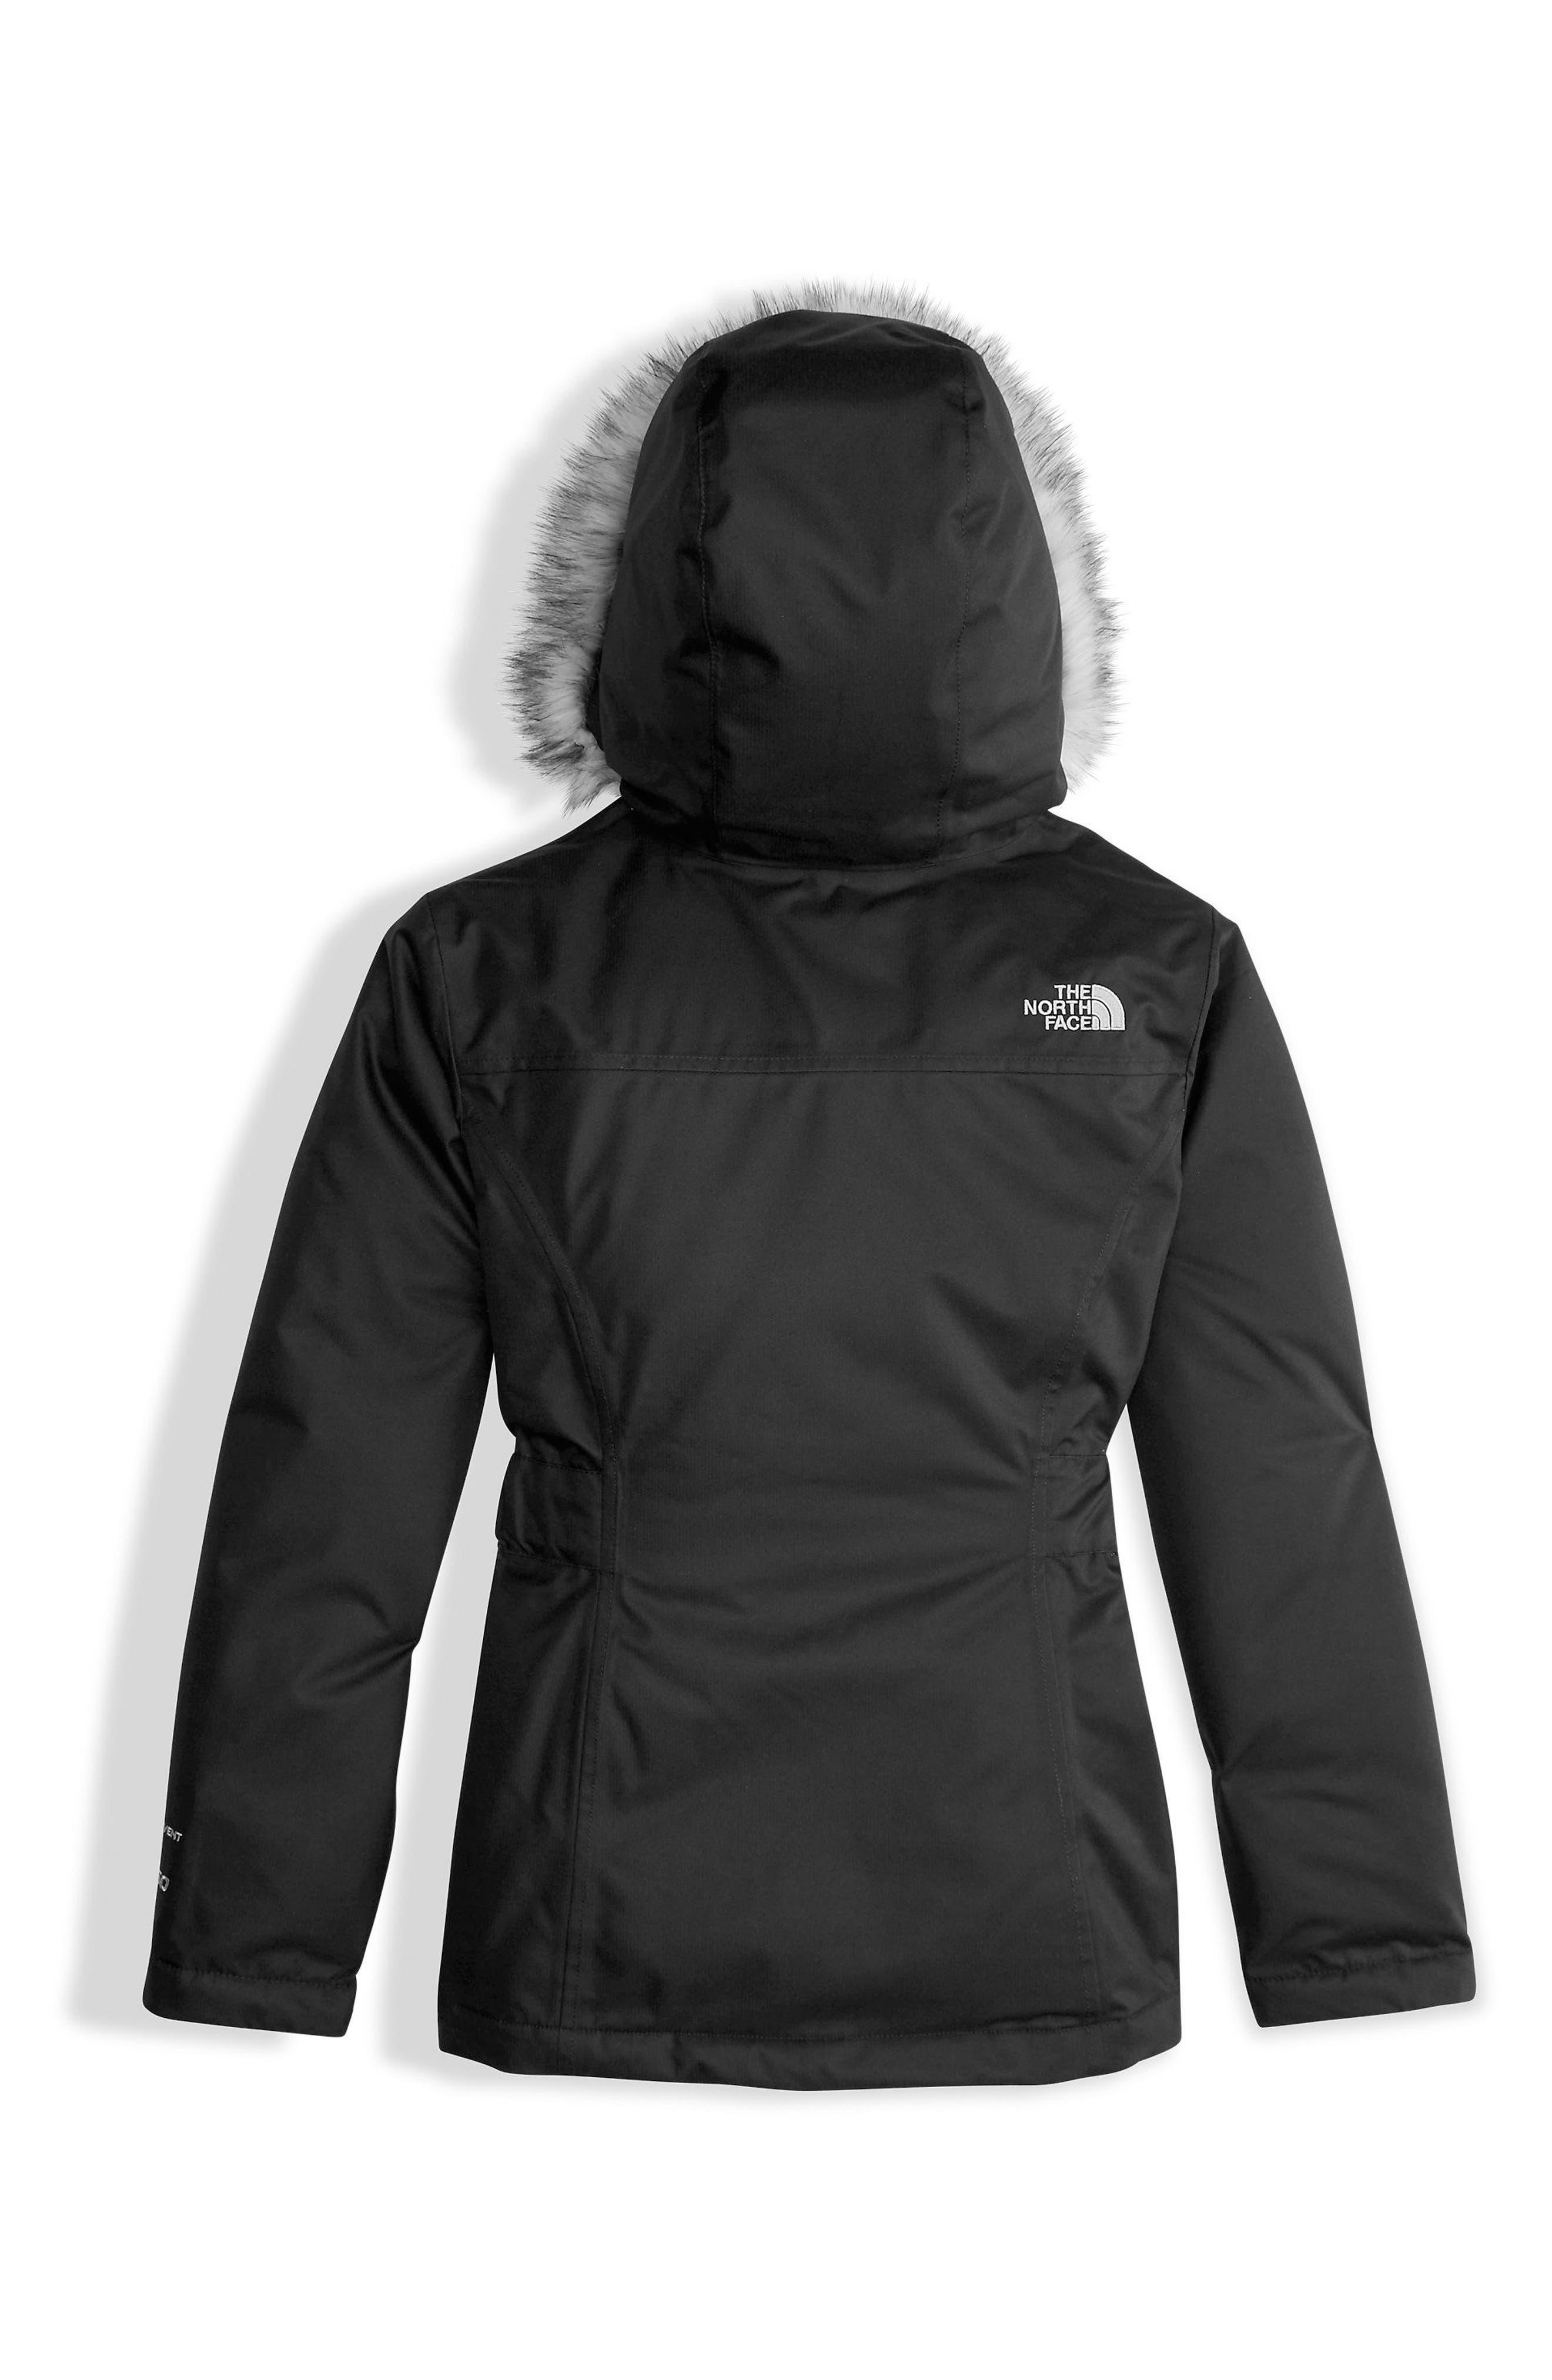 Greenland Waterproof 550-Fill Down Jacket,                             Alternate thumbnail 2, color,                             Tnf Black